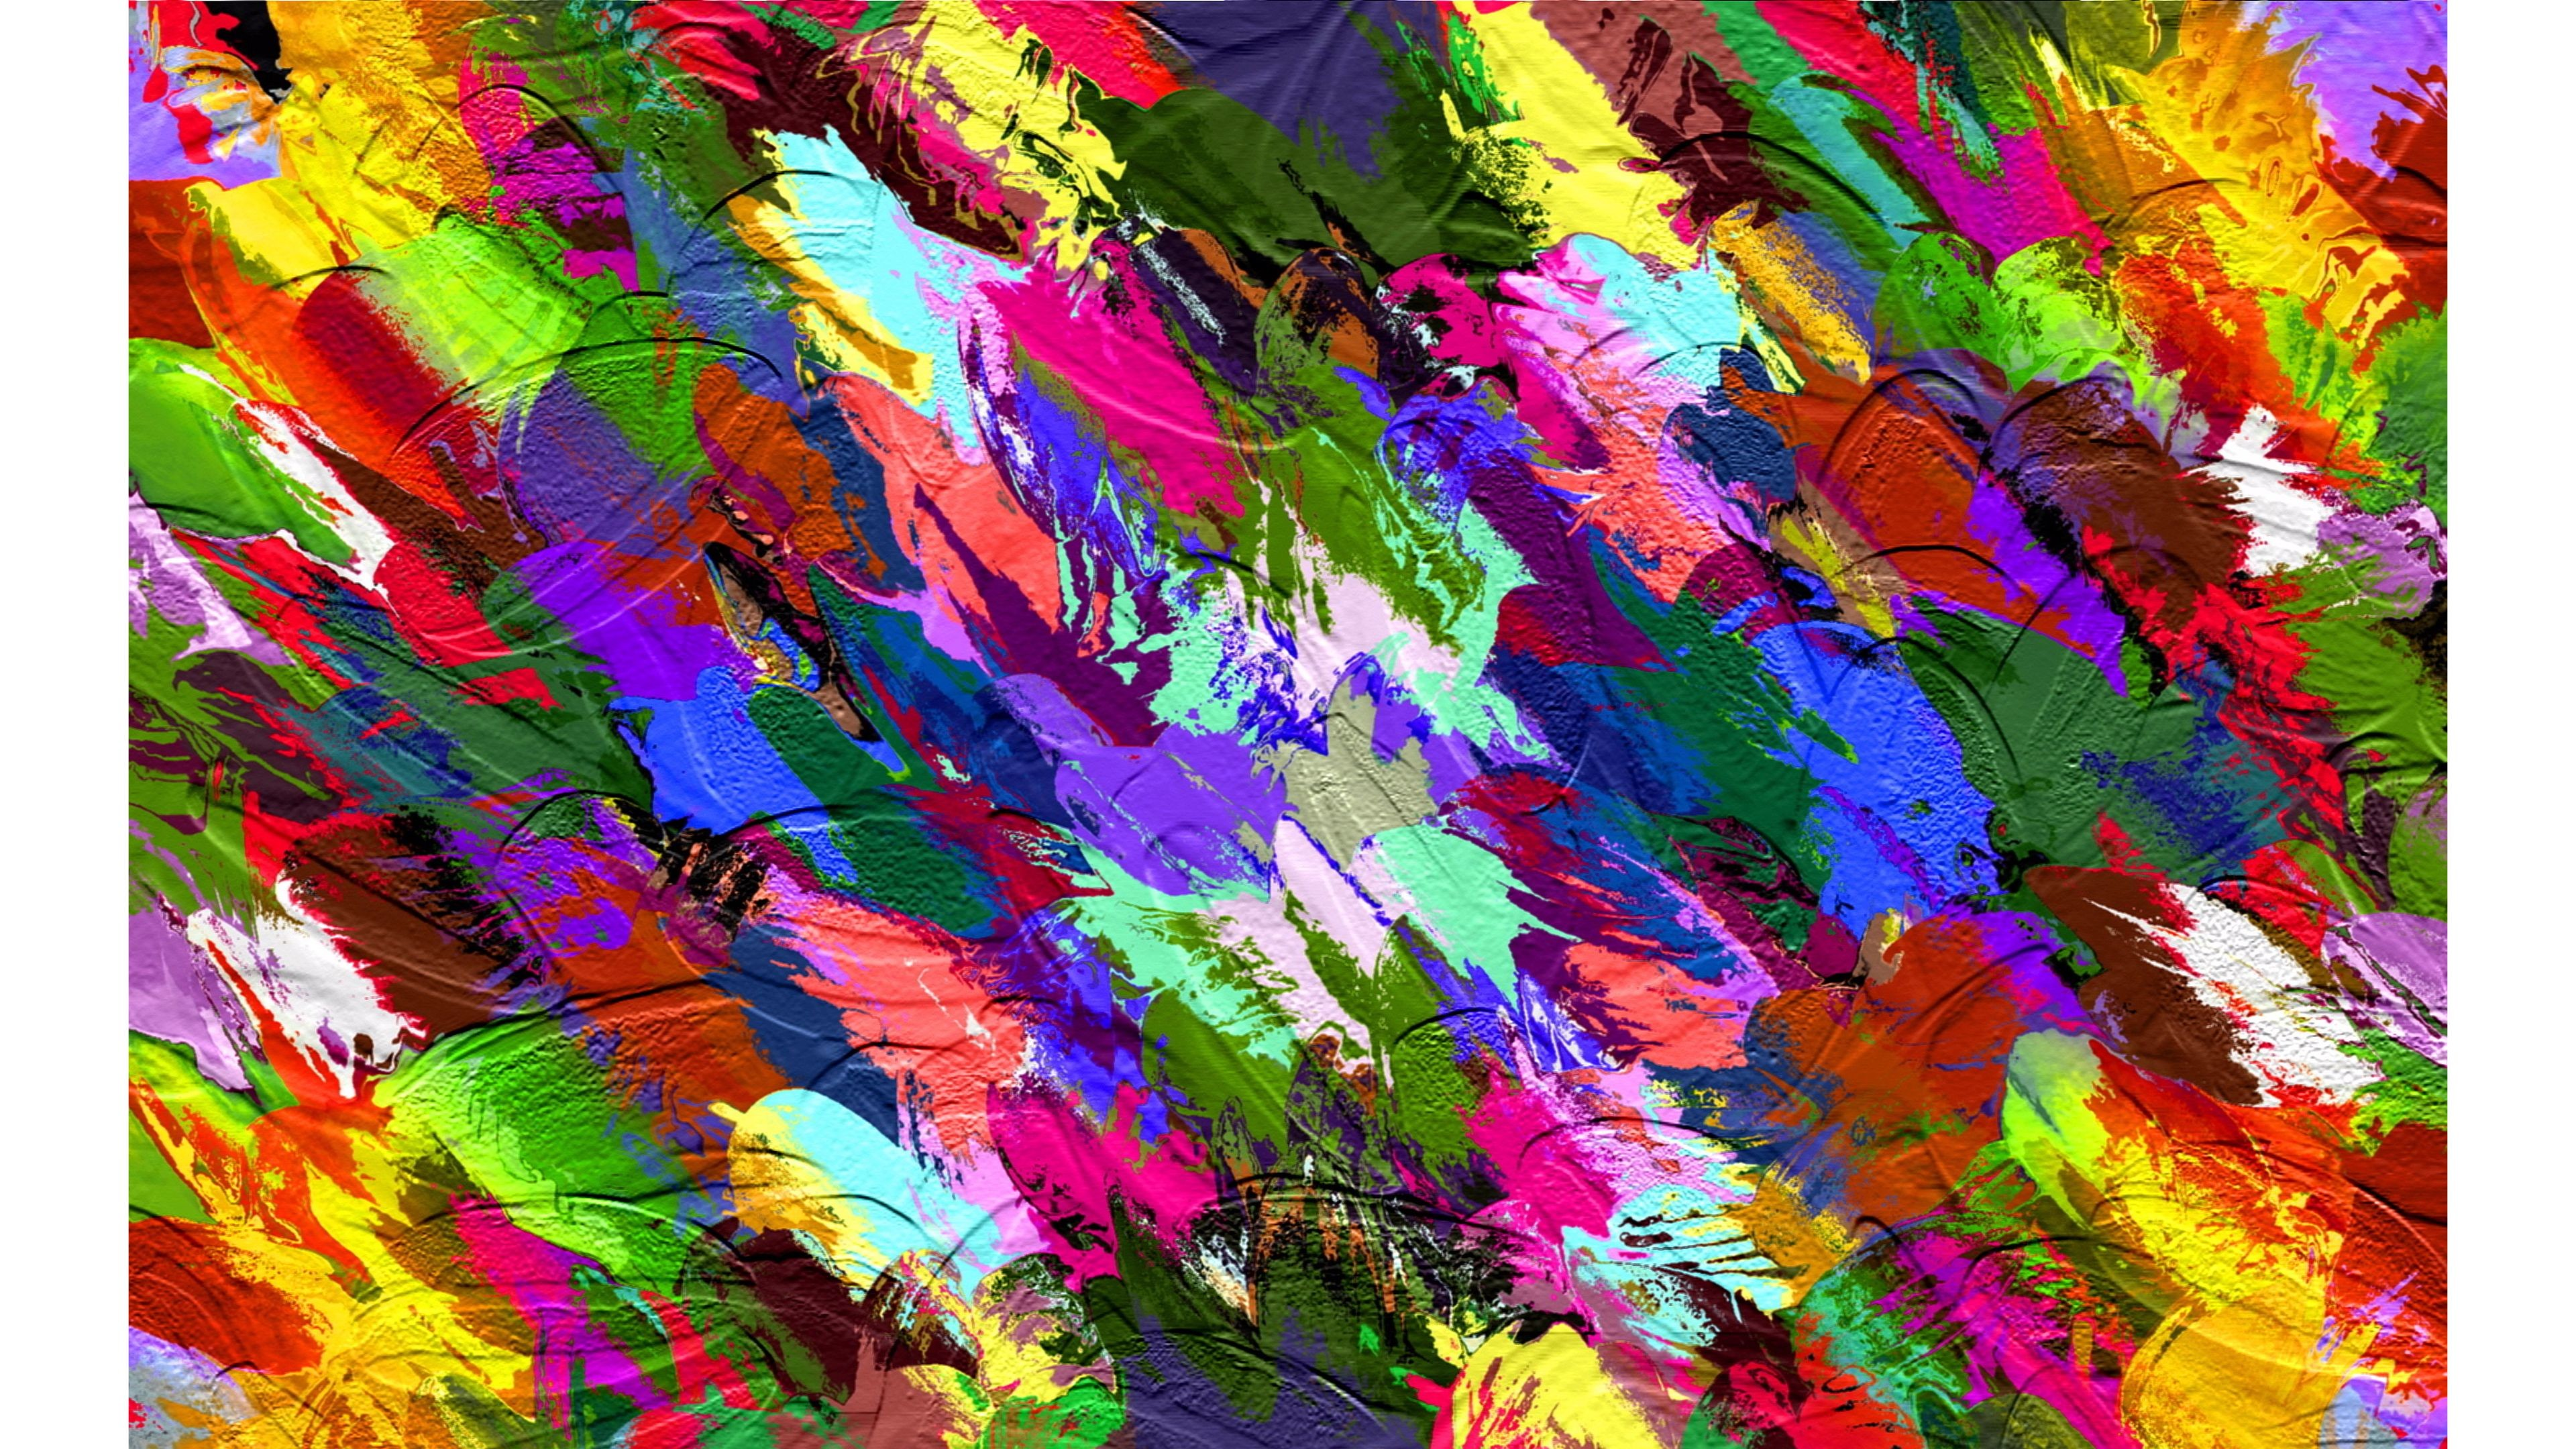 Res: 3840x2160, Color Splash Abstract 4K Wallpaper